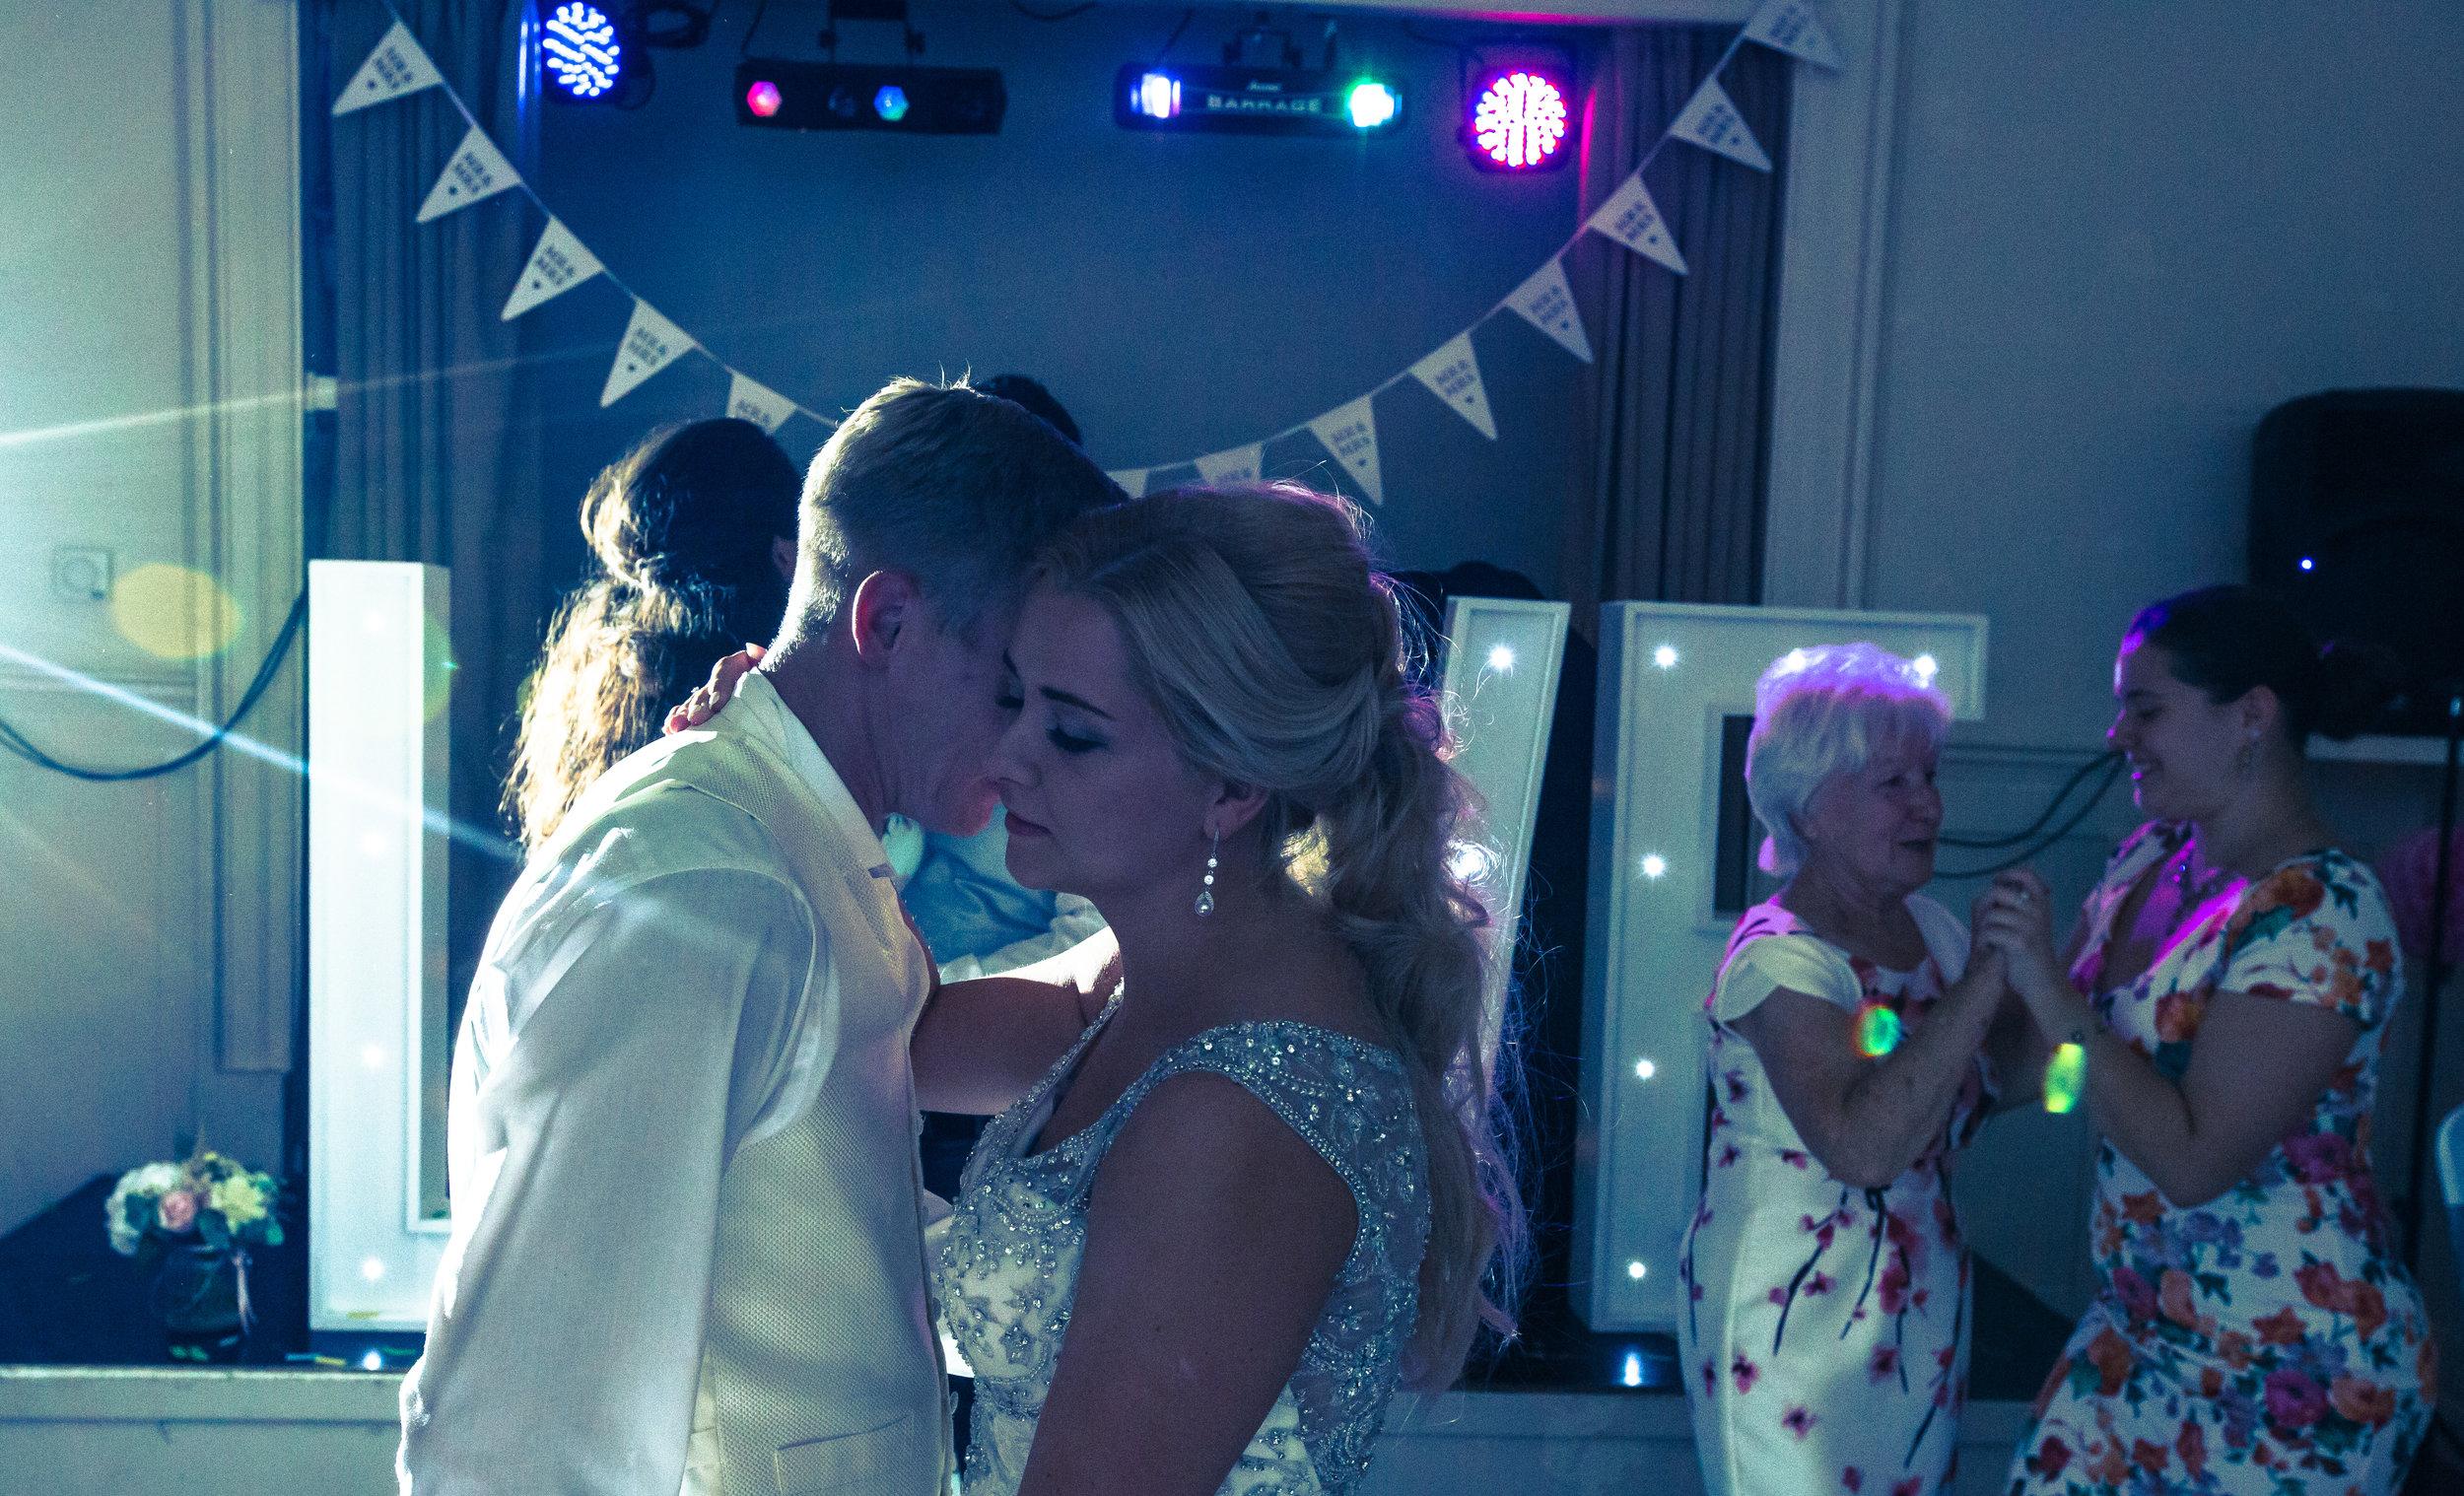 hitchin-hertfordshire-london-wedding-photography-catholic-church-first-dance-55